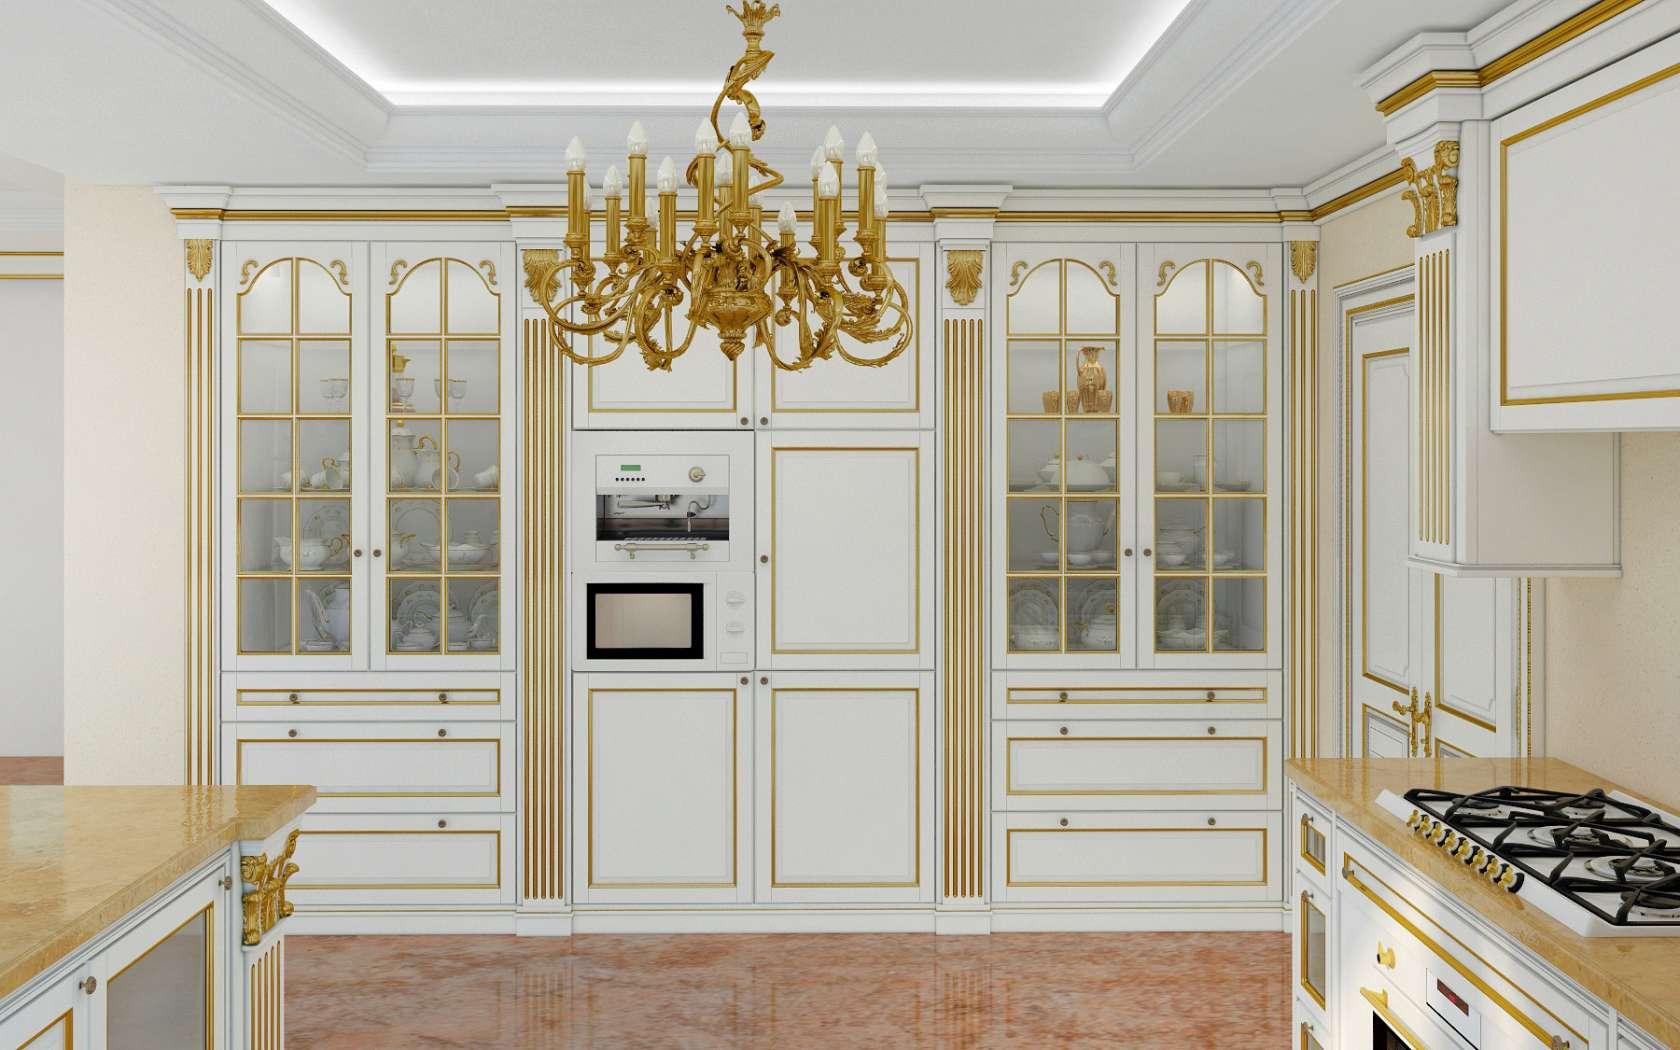 Cucine Di Lusso Classiche : Cucina di lusso su misura legacy vimercati meda